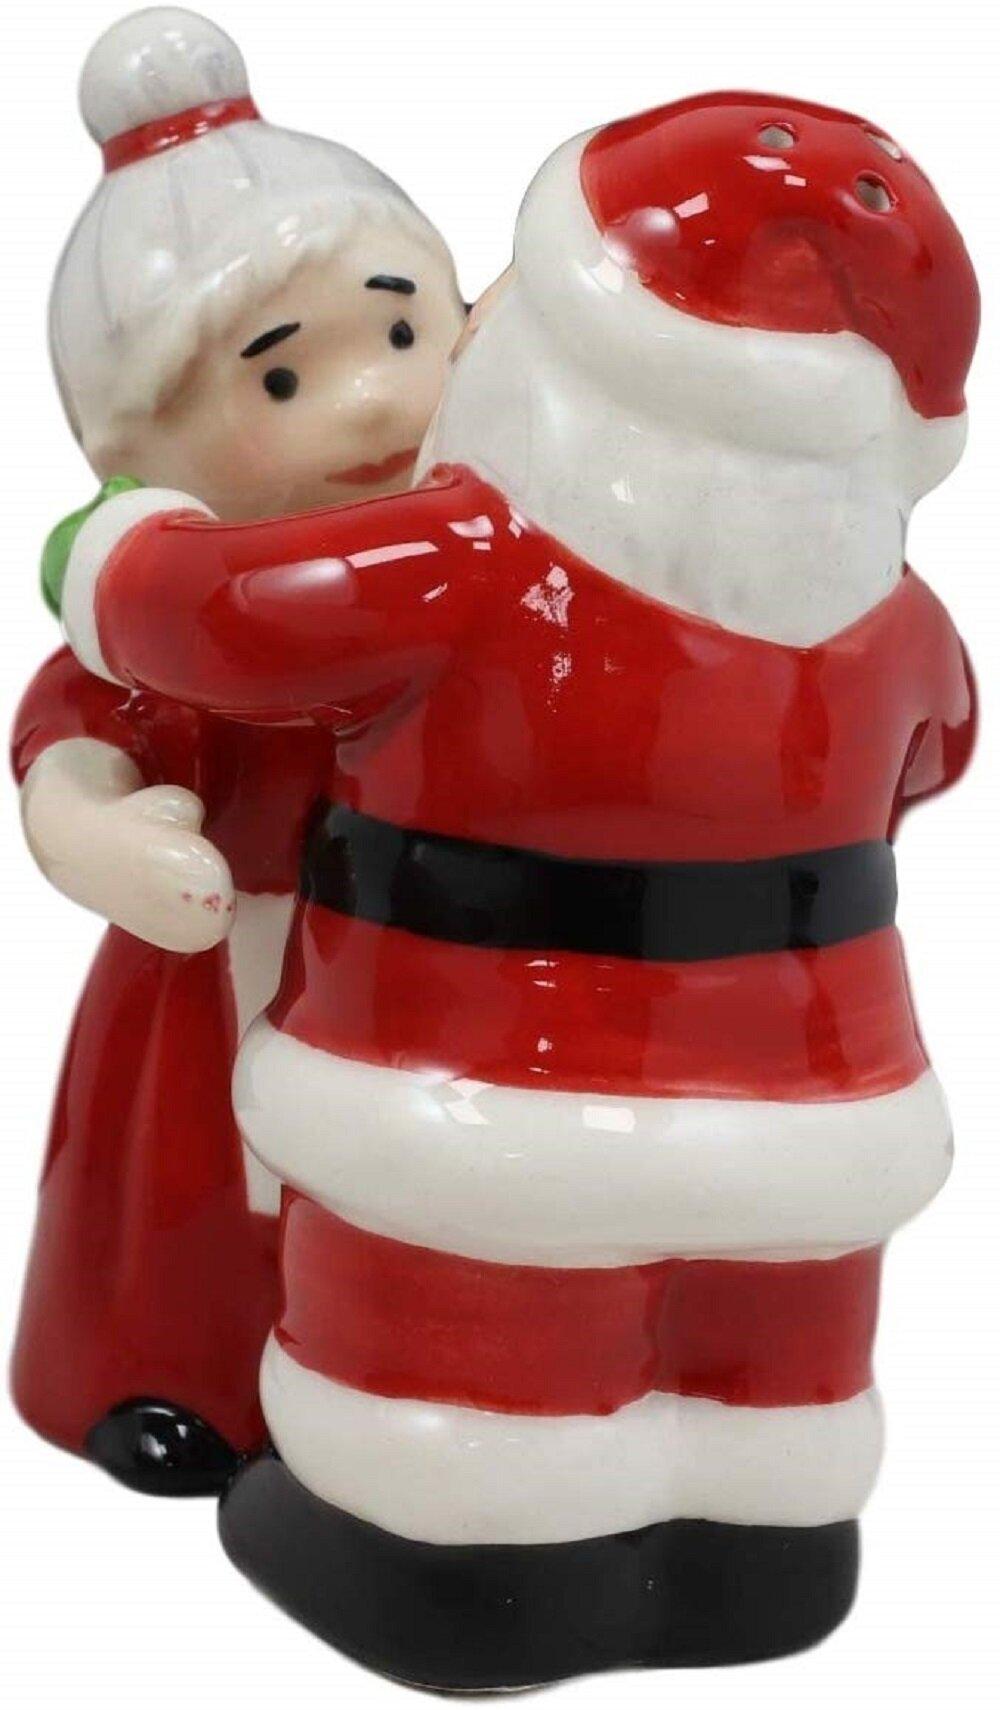 Ceramic Christmas Red Hats Salt /& Pepper 2 Unit Set